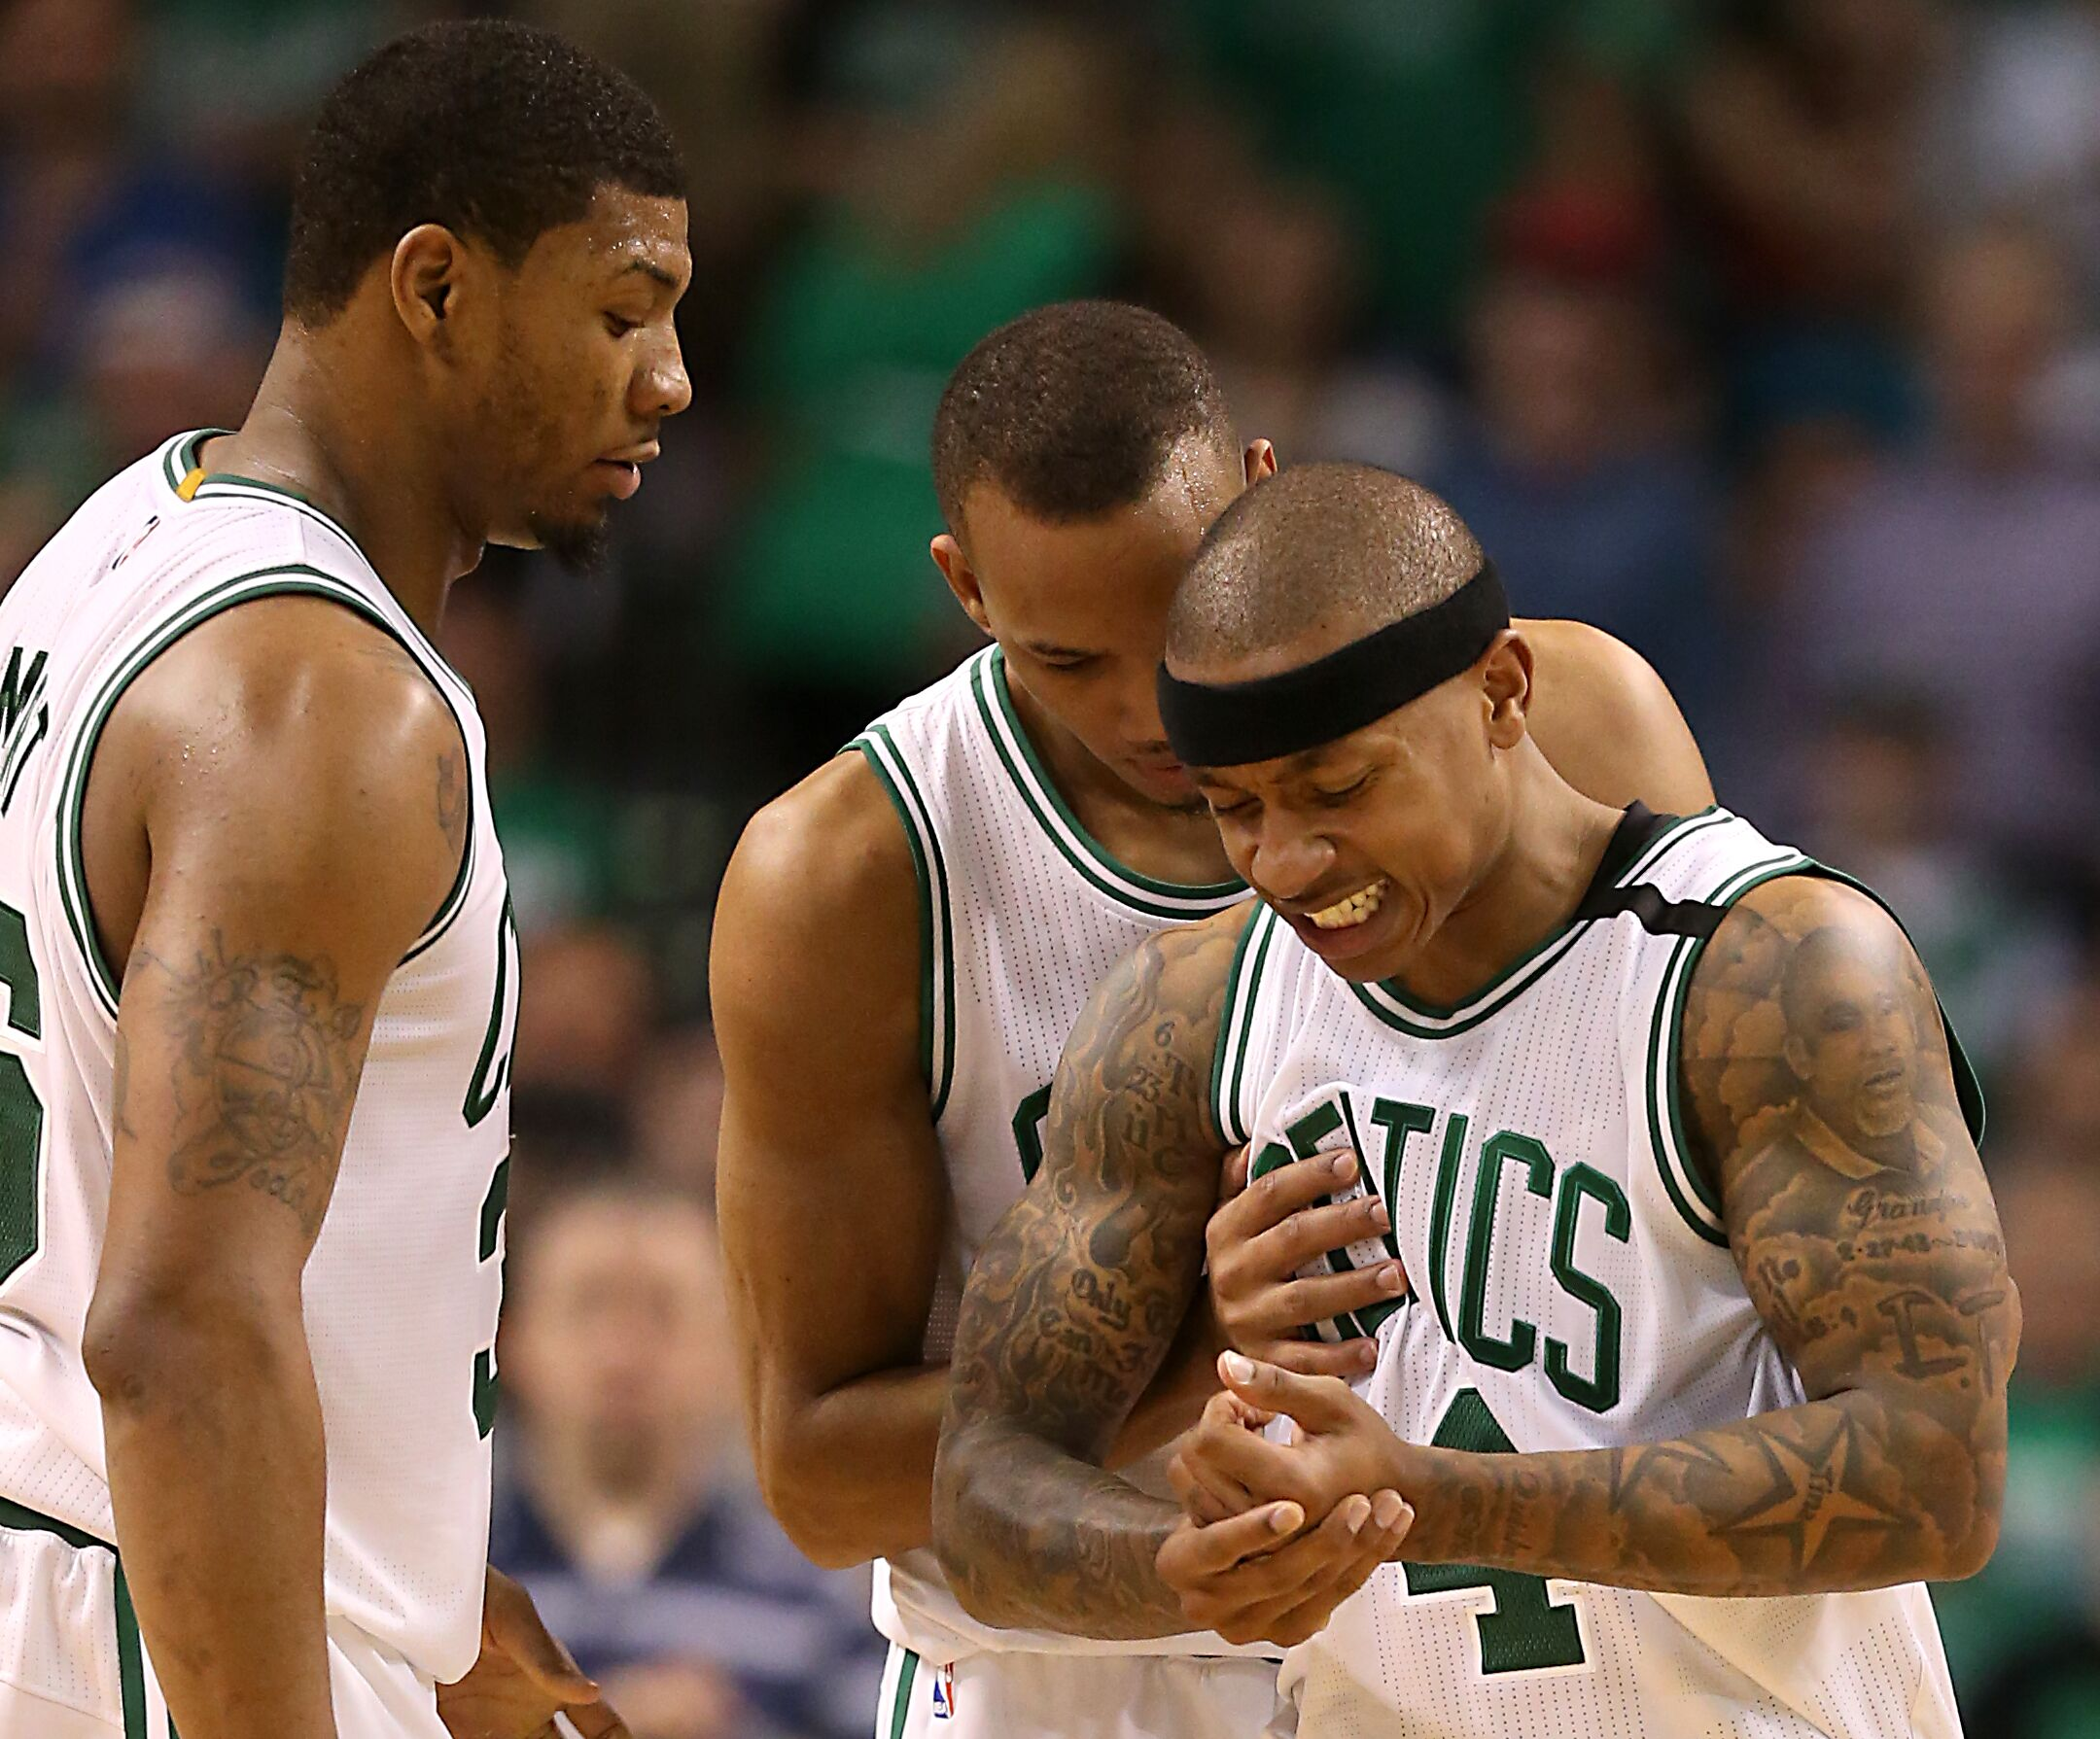 Boston April 16 Boston Celtics Marcus Smart And Avery Bradley Checks On Teammate Isaiah